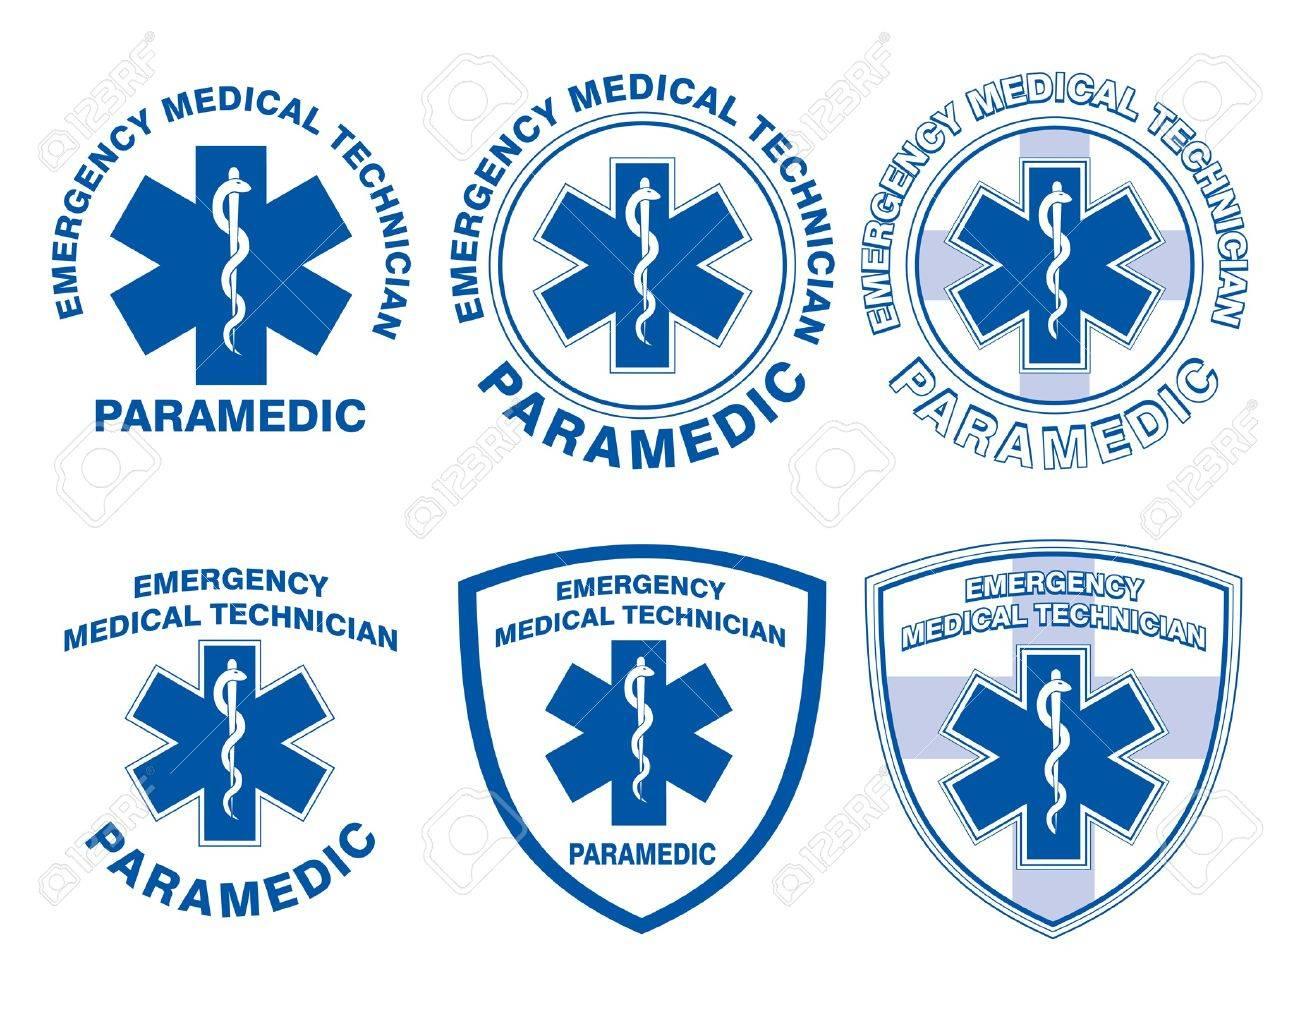 EMT Paramedic Medical Designs is an illustration of six EMT or paramedic designs with star of life medical symbols - 21598199